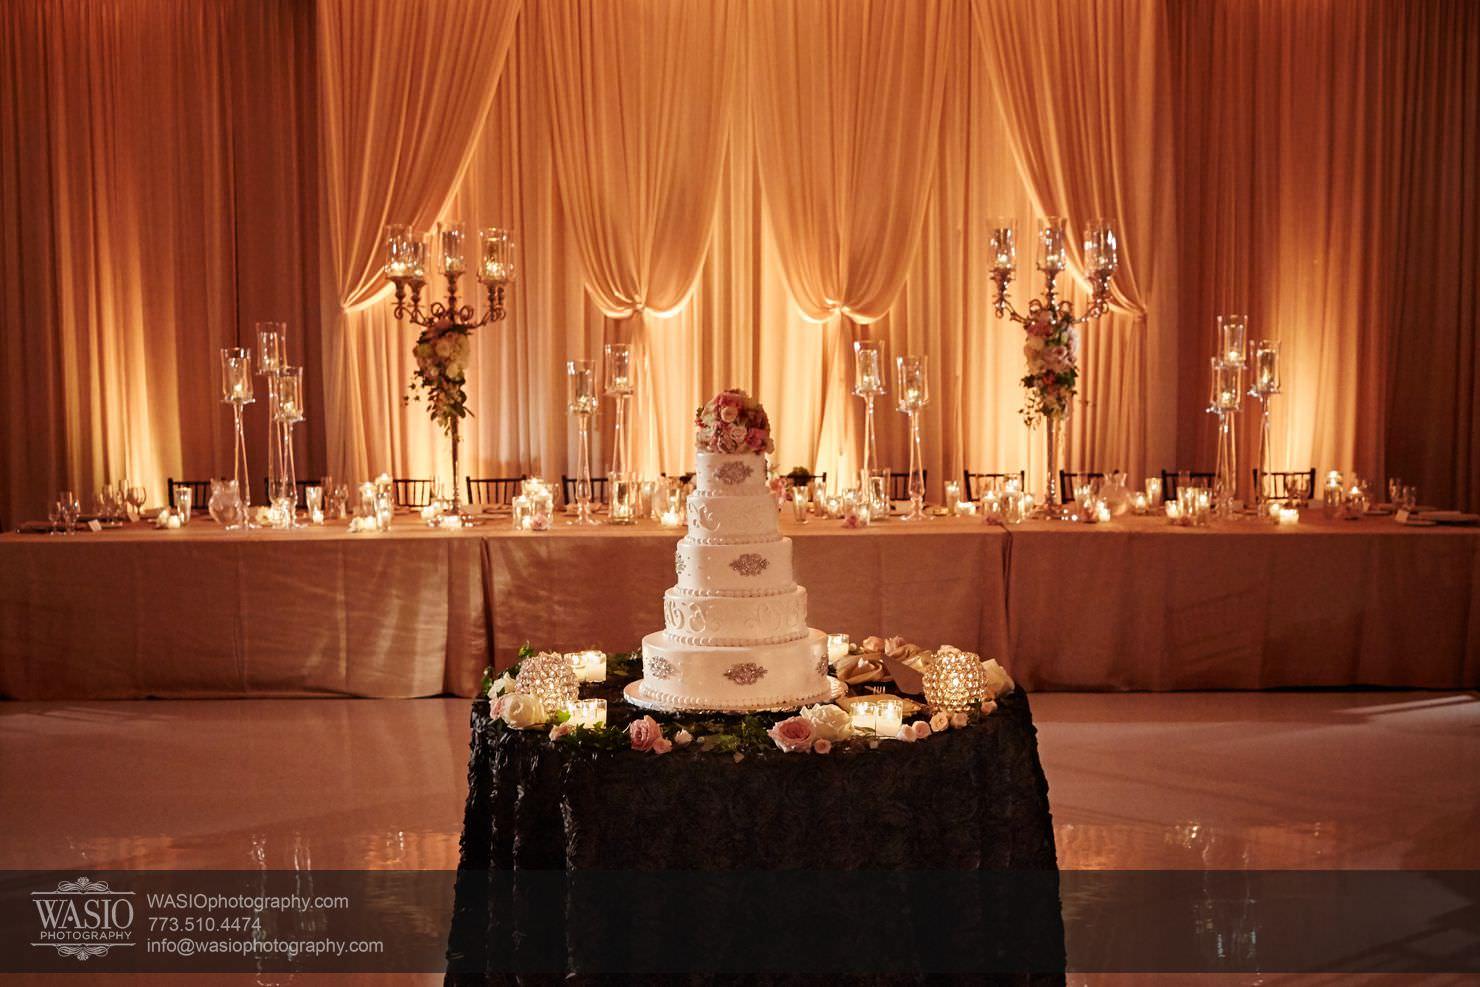 042_Chicago-Spring-Wedding_Chrissy-Andrew_3P4C6251 Chicago Spring Wedding - Chrissy + Andrew